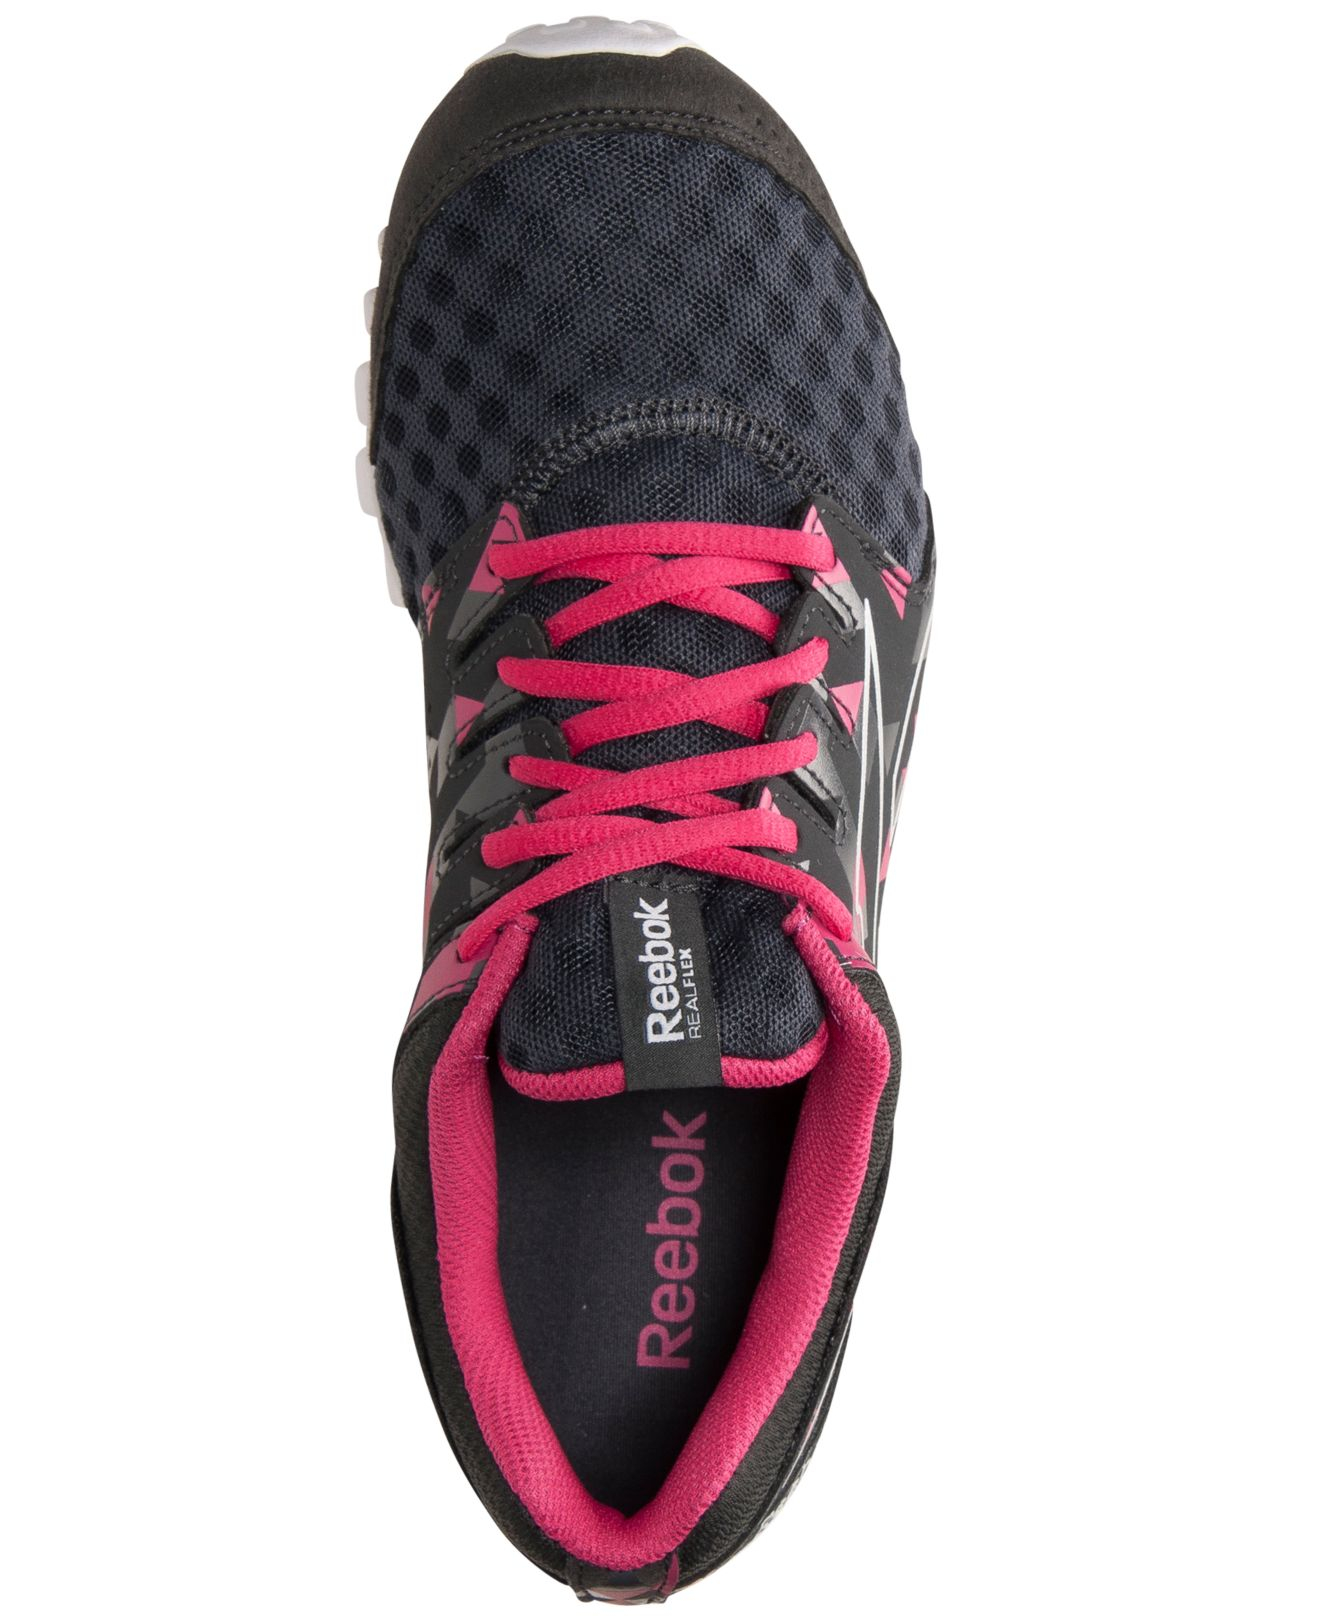 b1f9d6614ab432 Lyst - Reebok Womens Realflex Scream 30 Running Sneakers From Finish ...